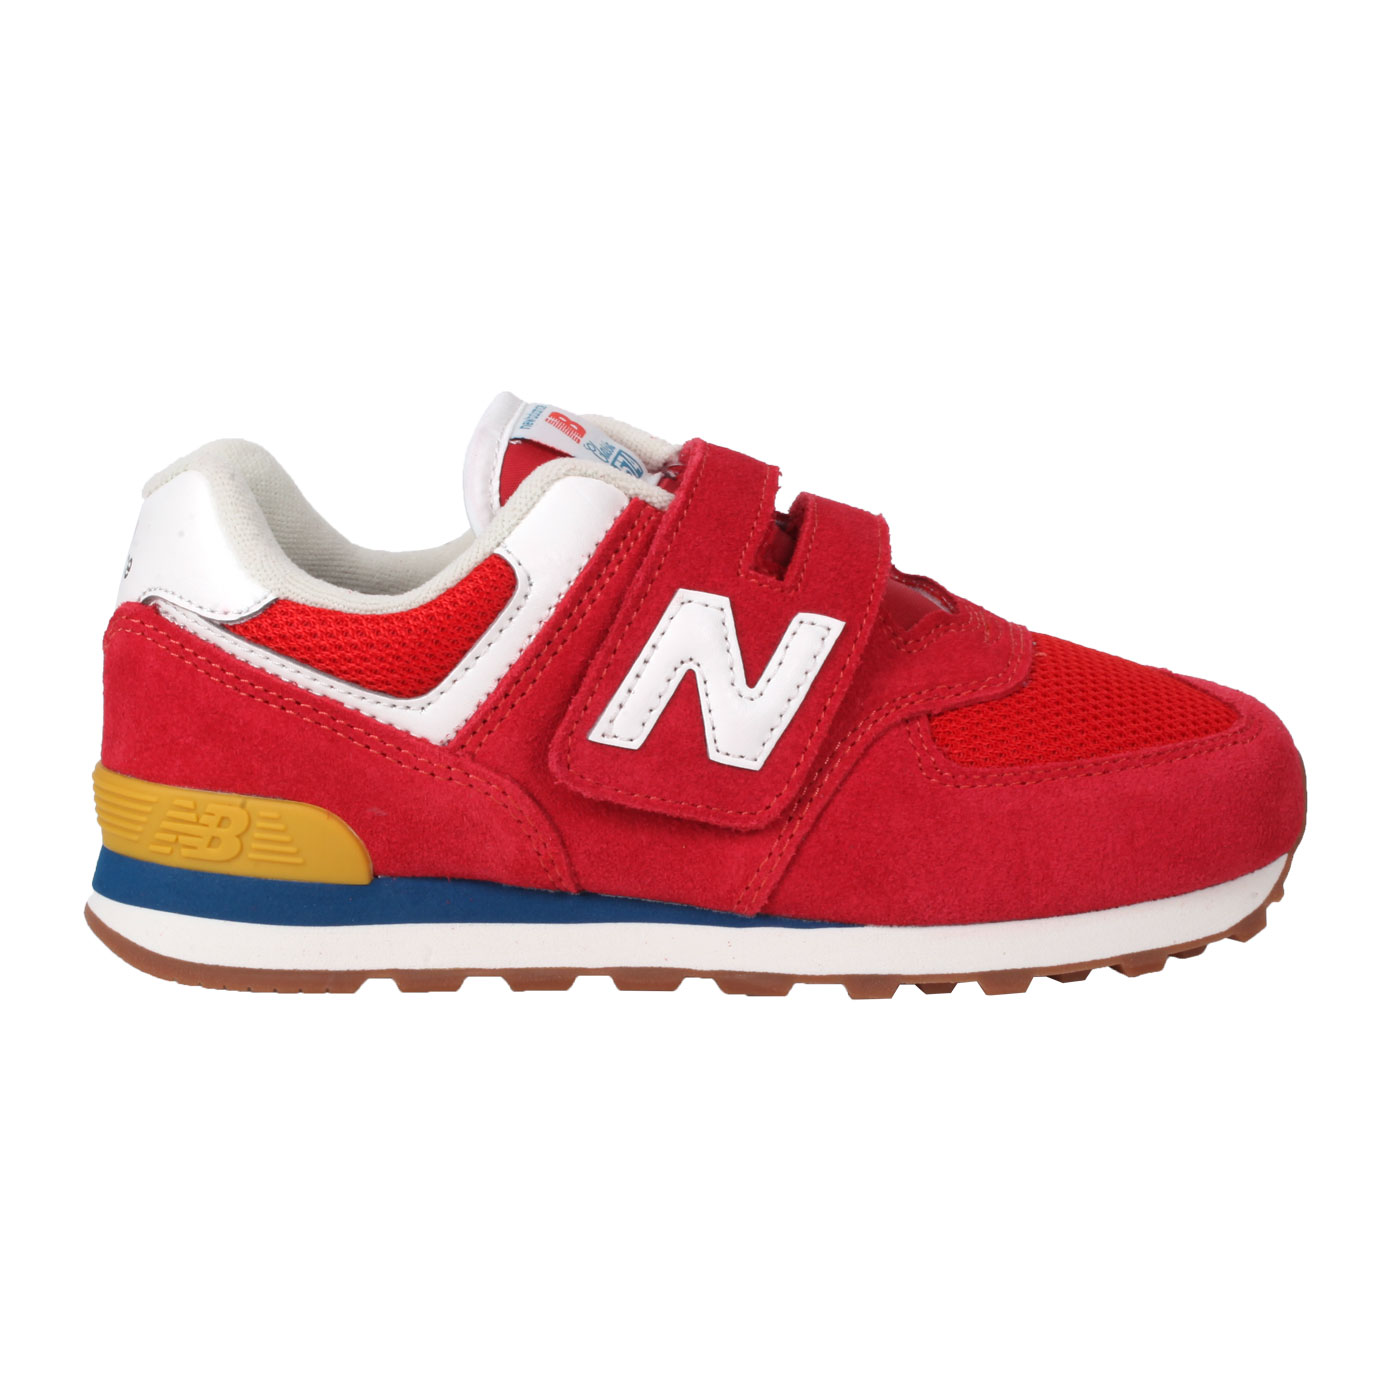 NEW BALANCE 中童休閒運動鞋-WIDE PV574HA2 - 紅藍白卡其